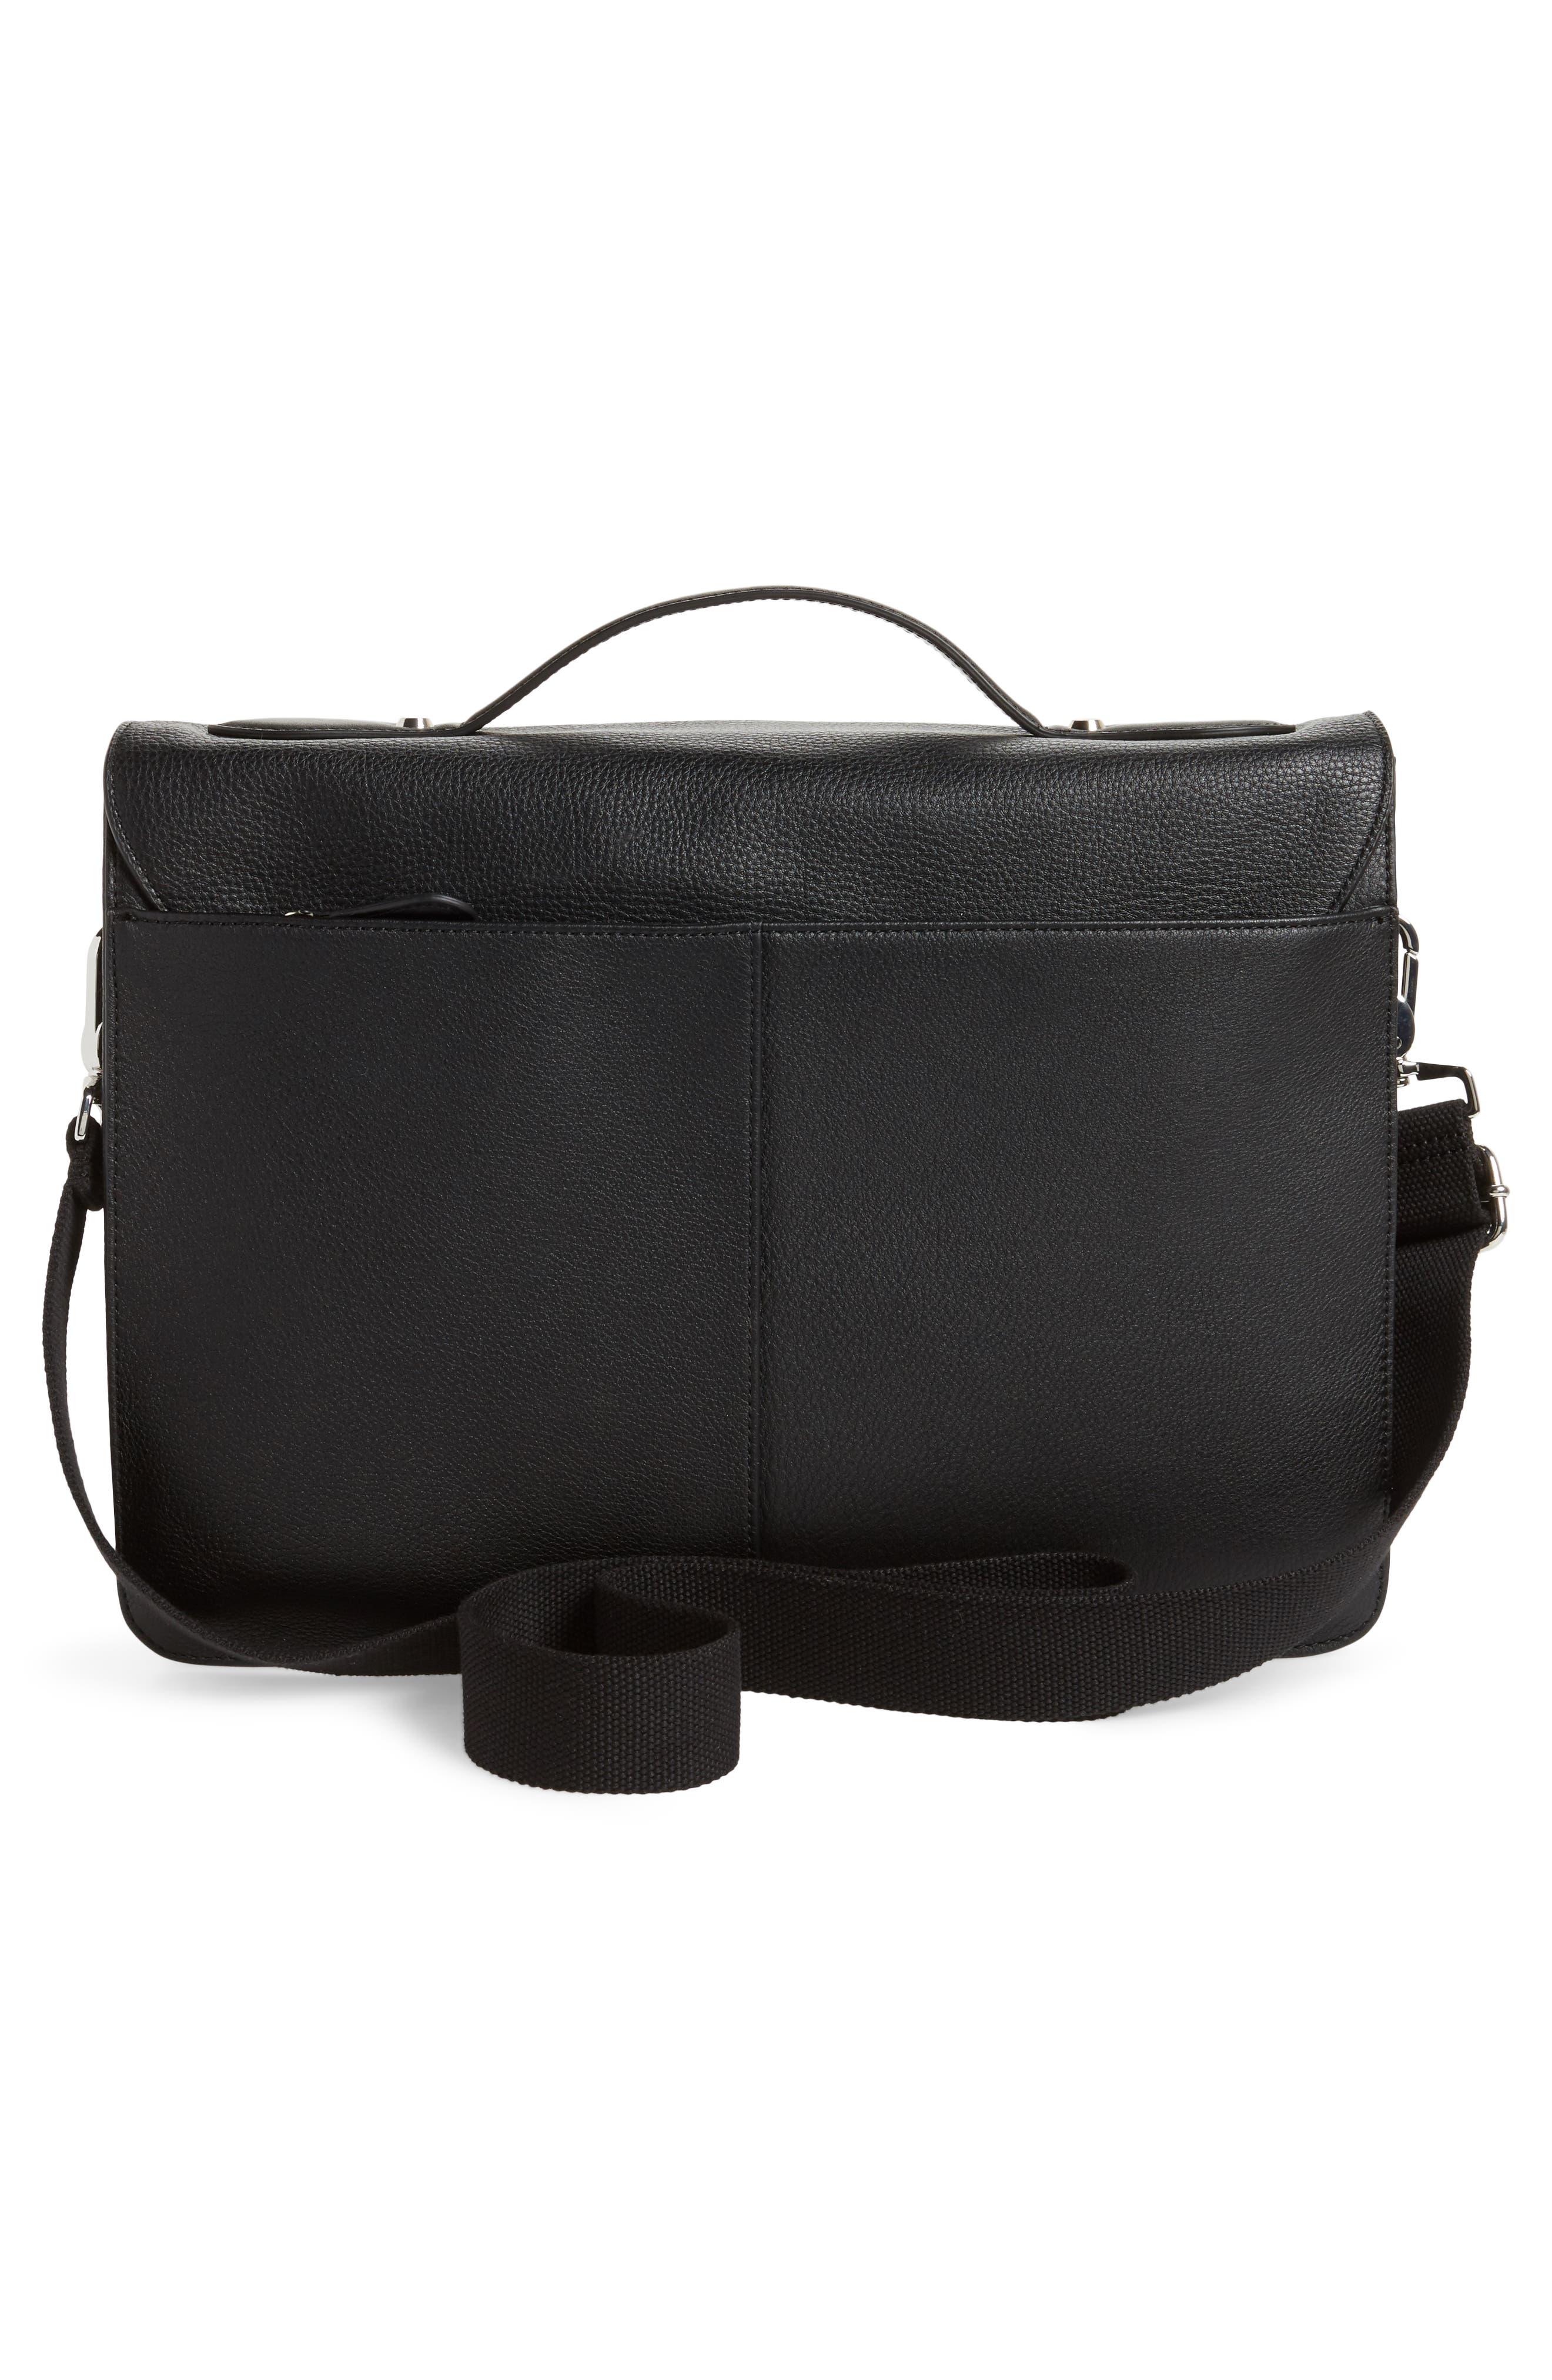 Munch Leather Satchel Briefcase,                             Alternate thumbnail 3, color,                             Black